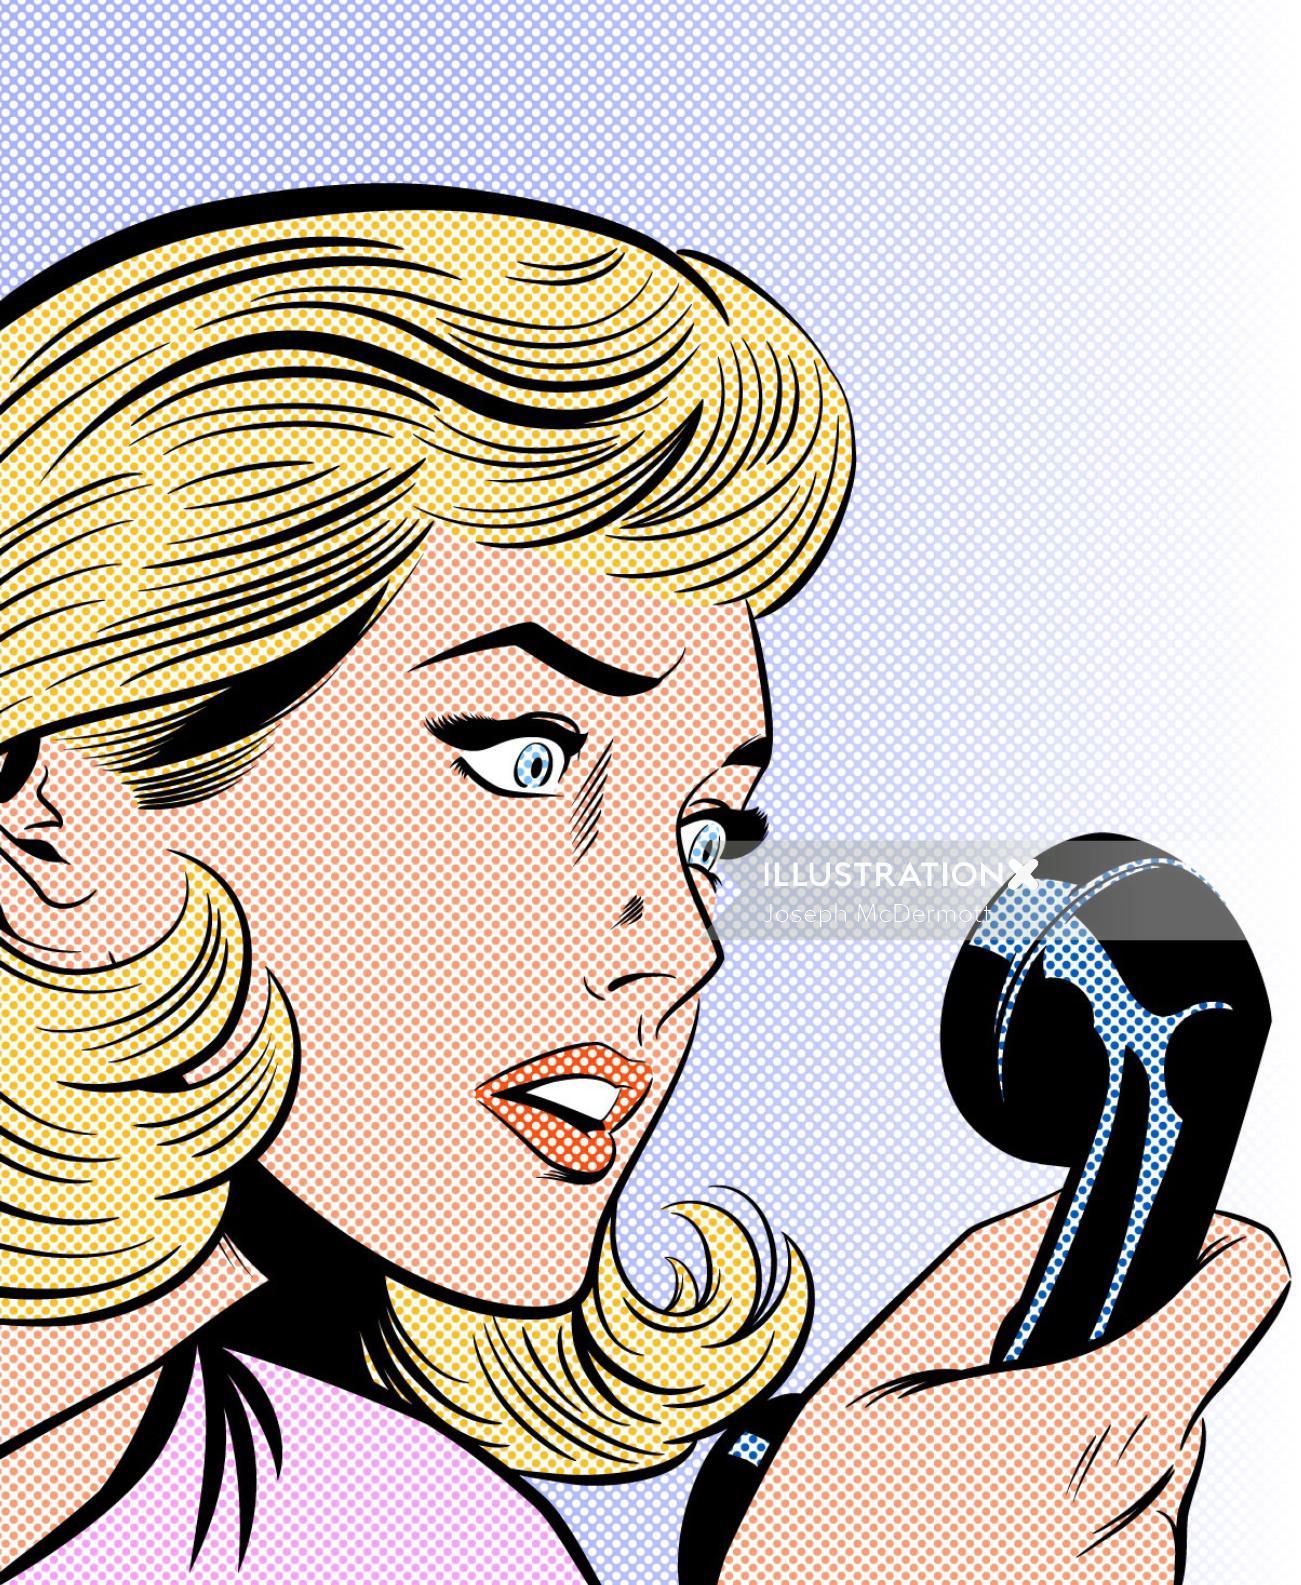 surprised Girl on telephone